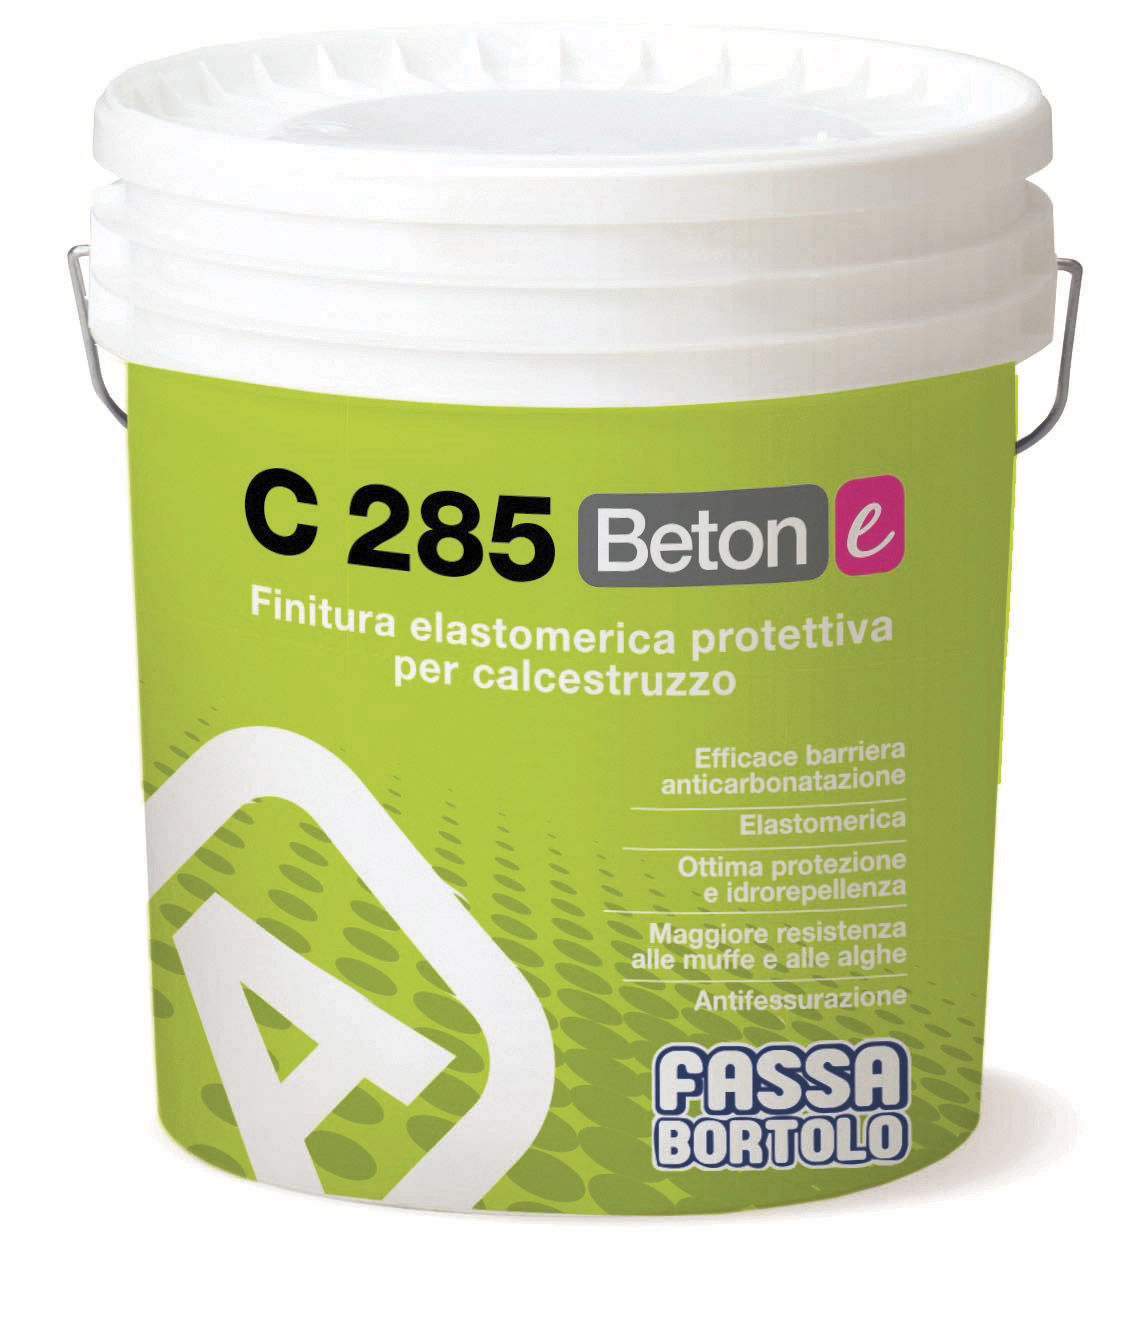 C 285 BETON-E